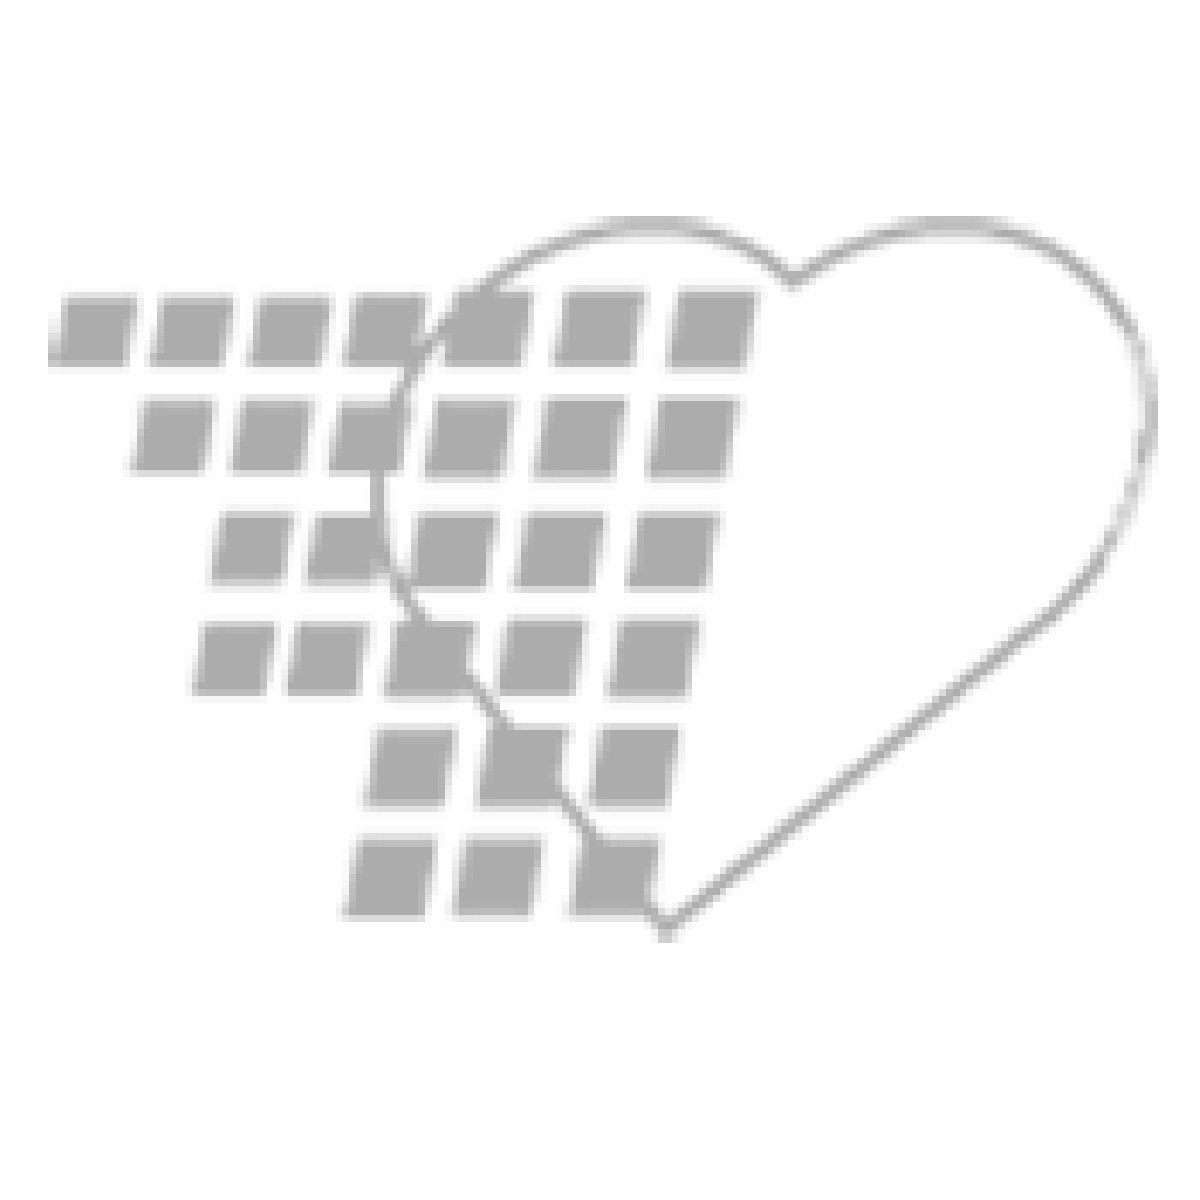 12-81-0011-BRN - SimLeggings® Pediatric Five Year Old Pair - Brown